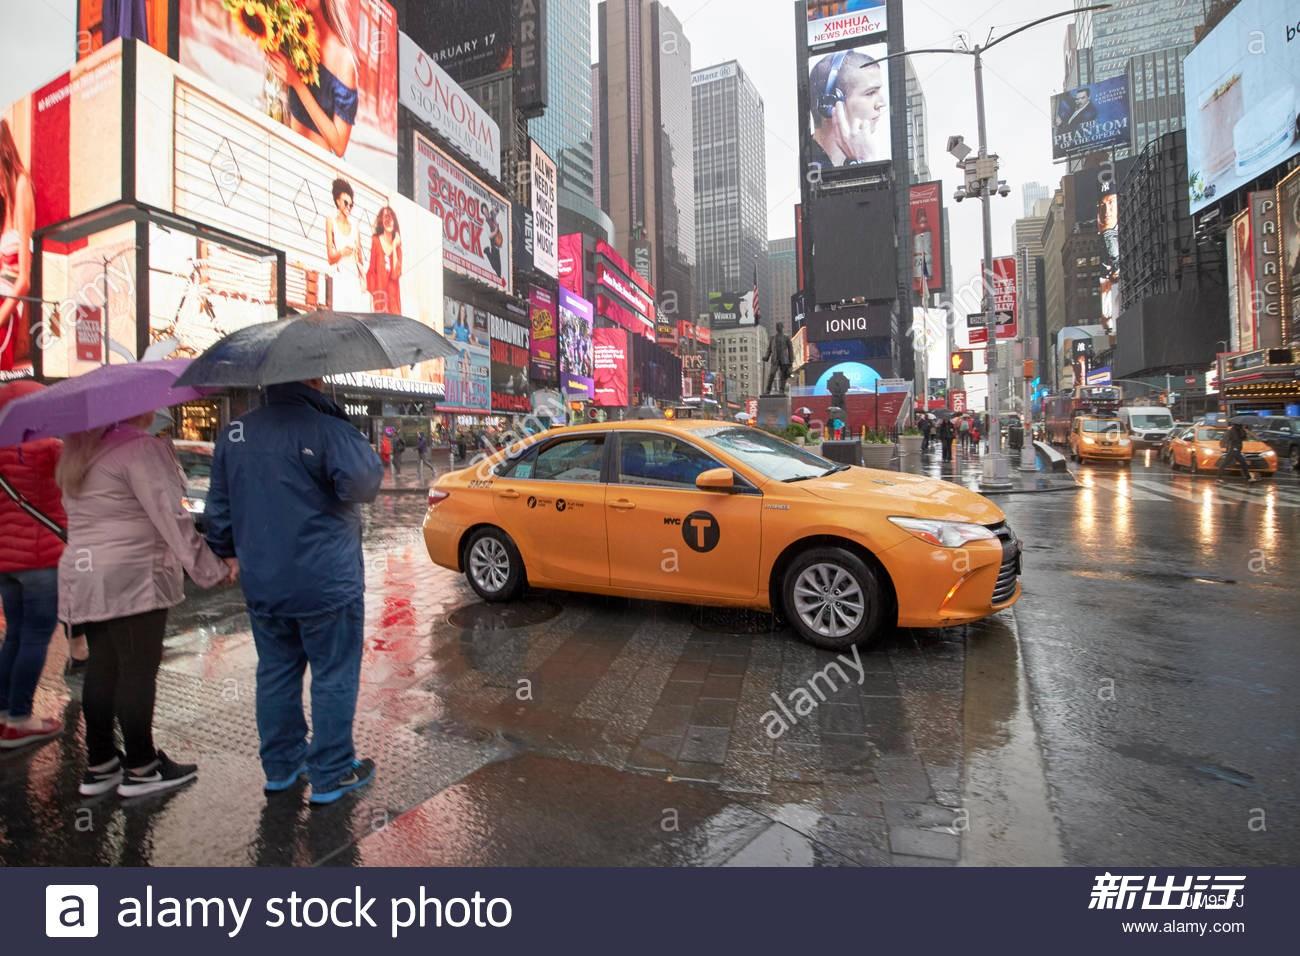 toyota-camry-hybrid-new-york-yellow-taxi-cab-crossing-times-square-JM95FJ.jpg